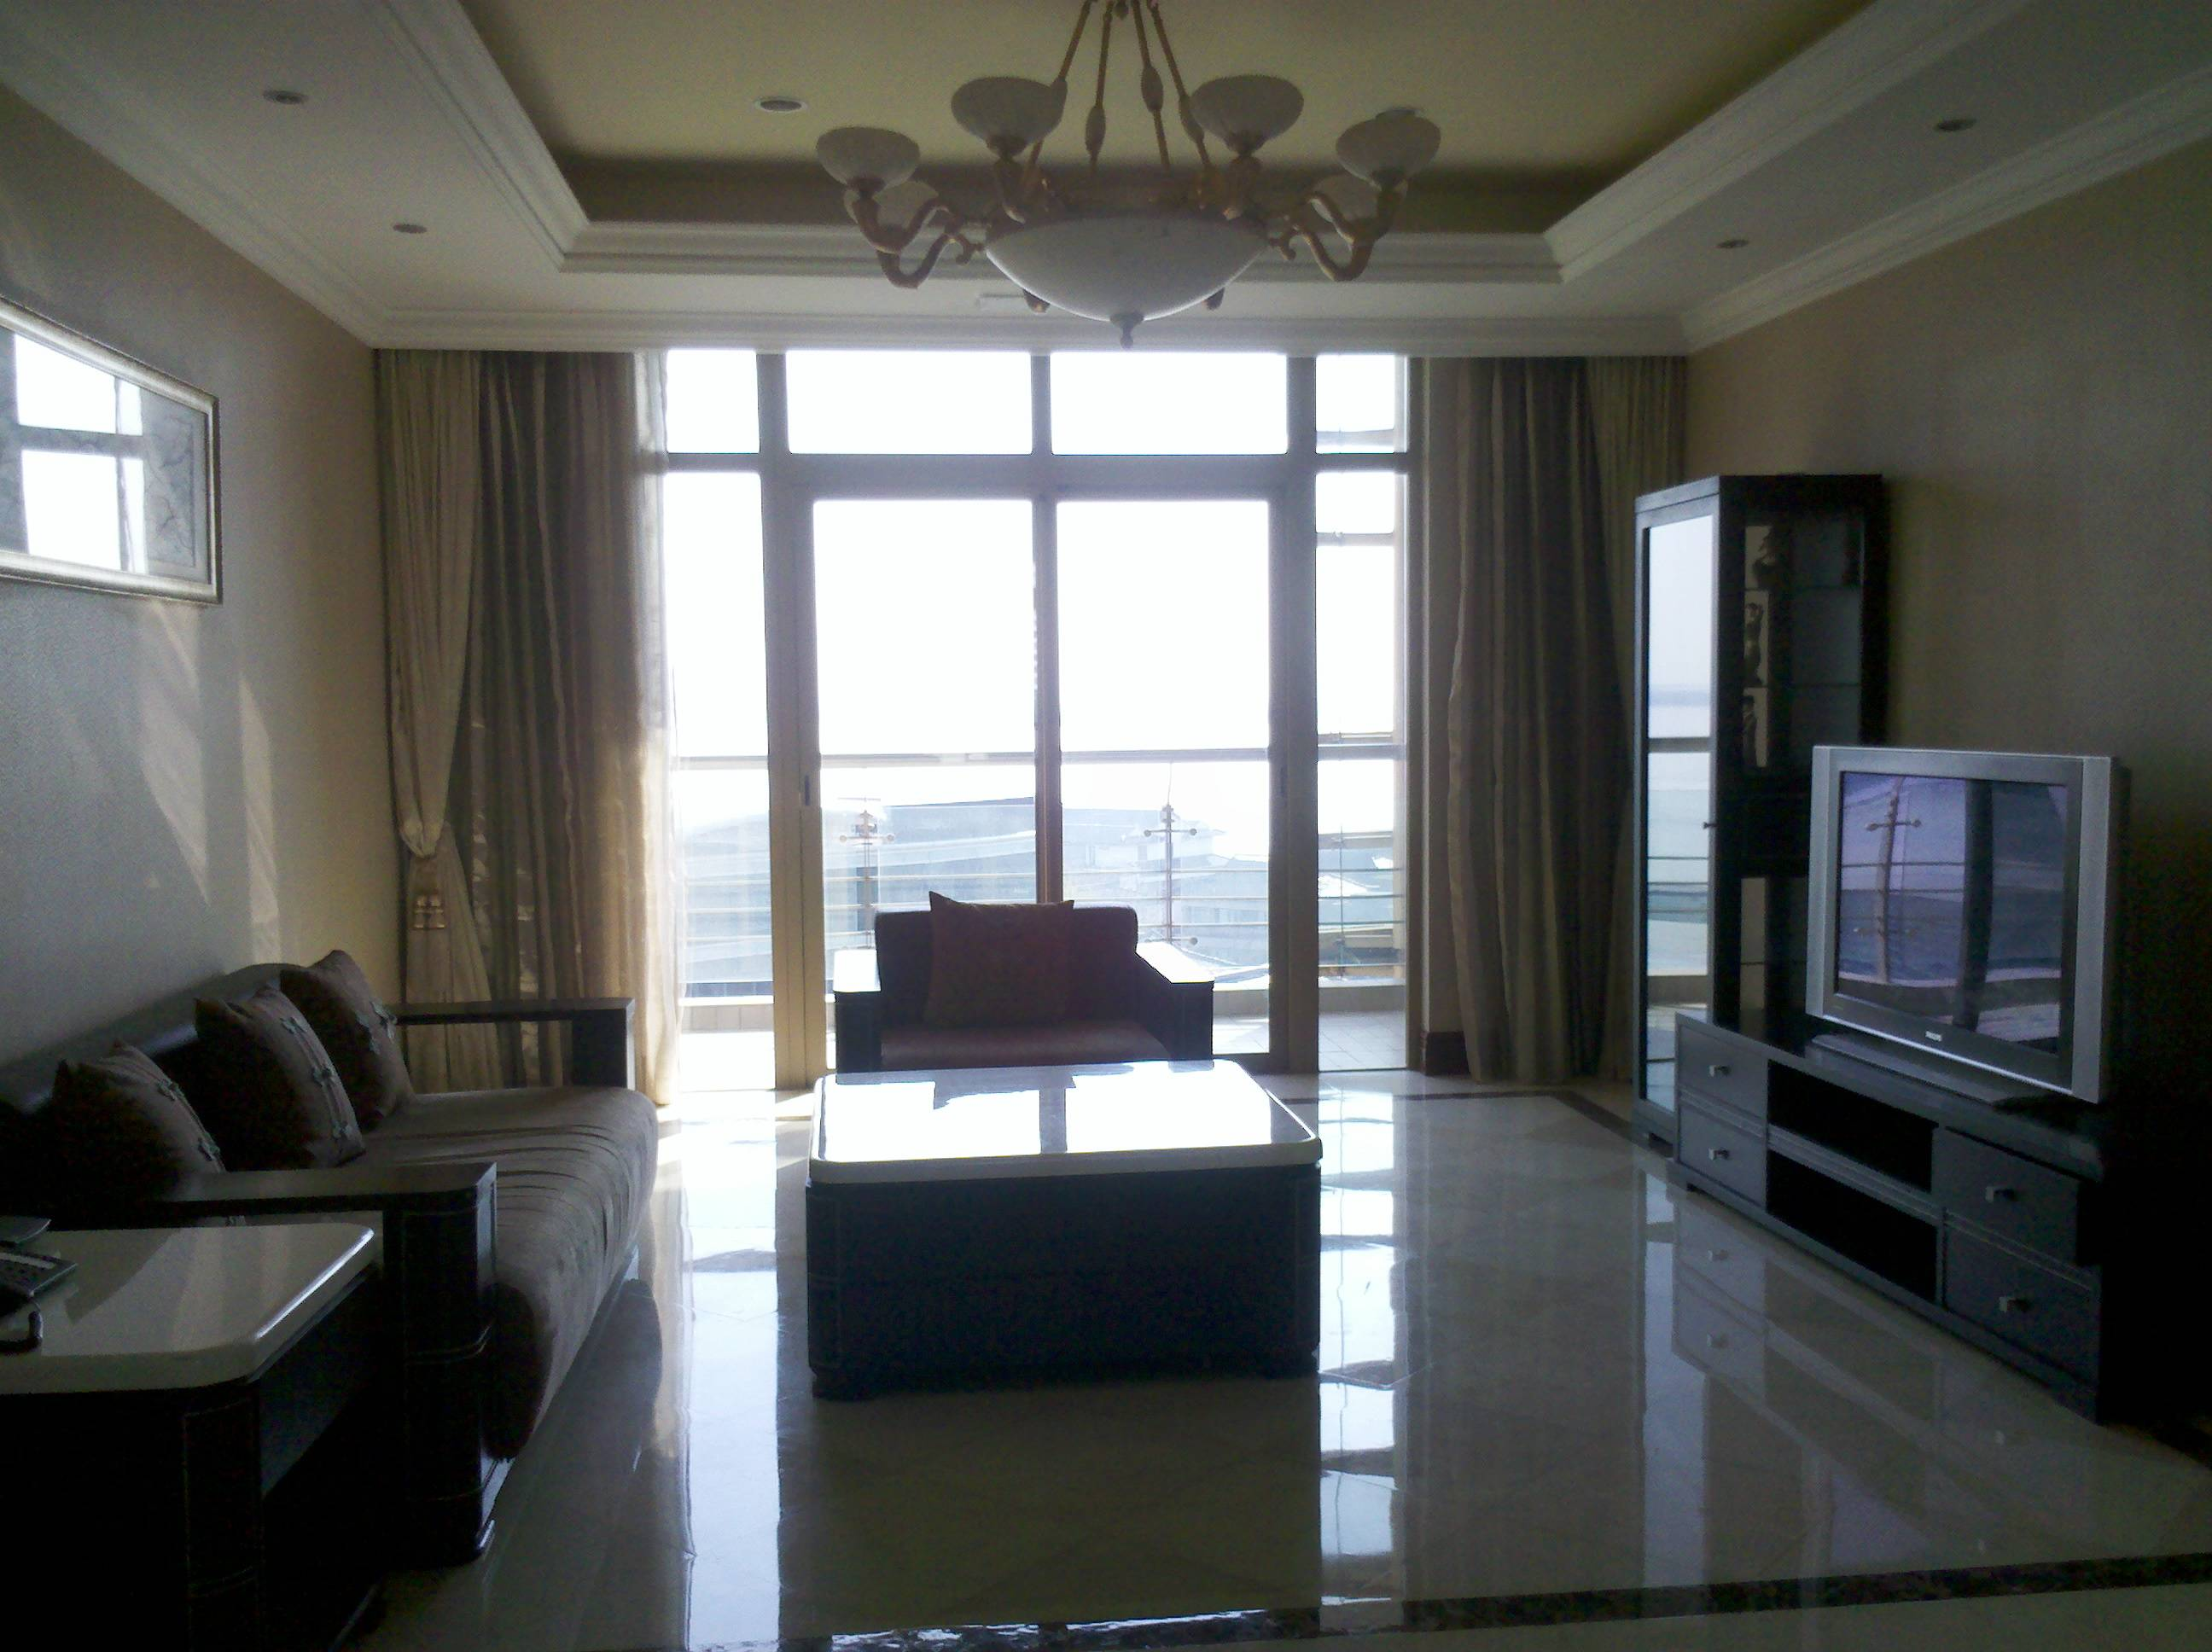 apartment for rent suzhou jiangsu china nice apartment